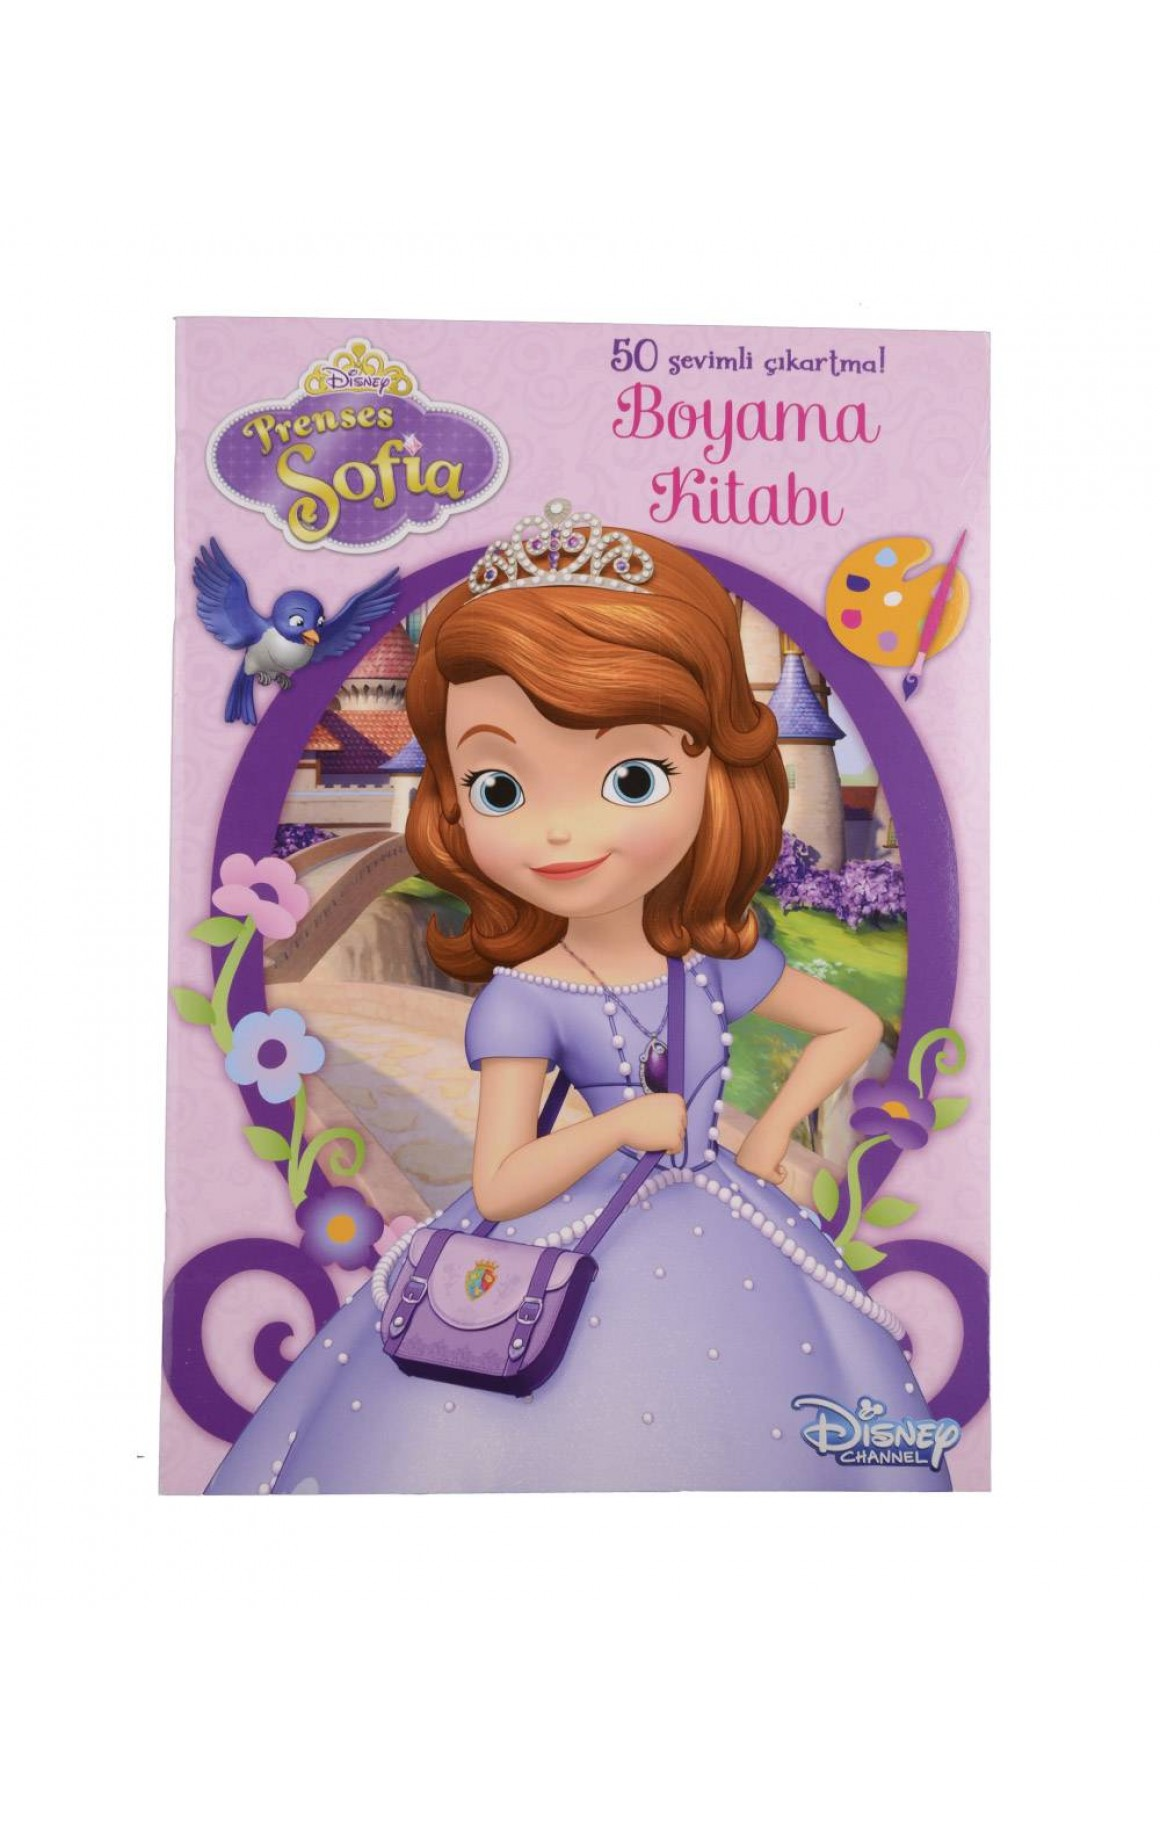 Disney Prenses Sofia Cikartmali Boyama Kitabi